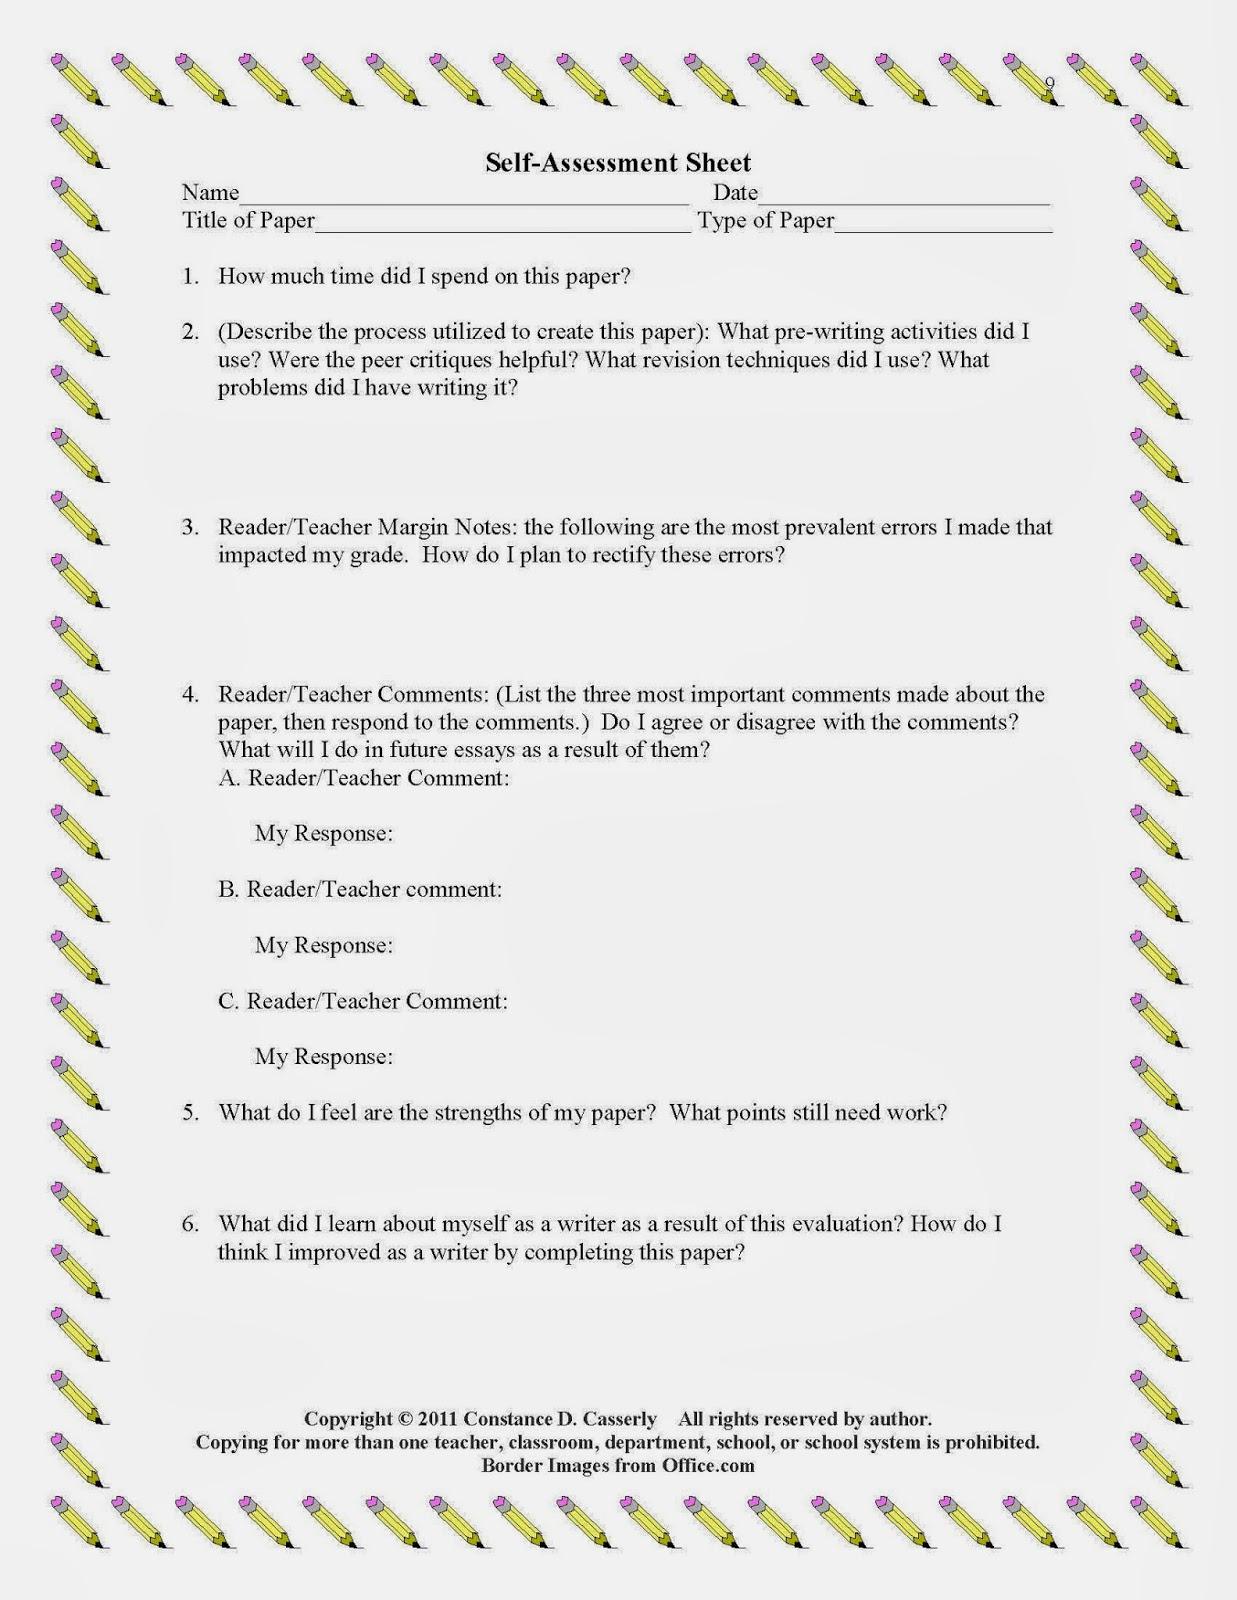 The new school mfa creative writing program